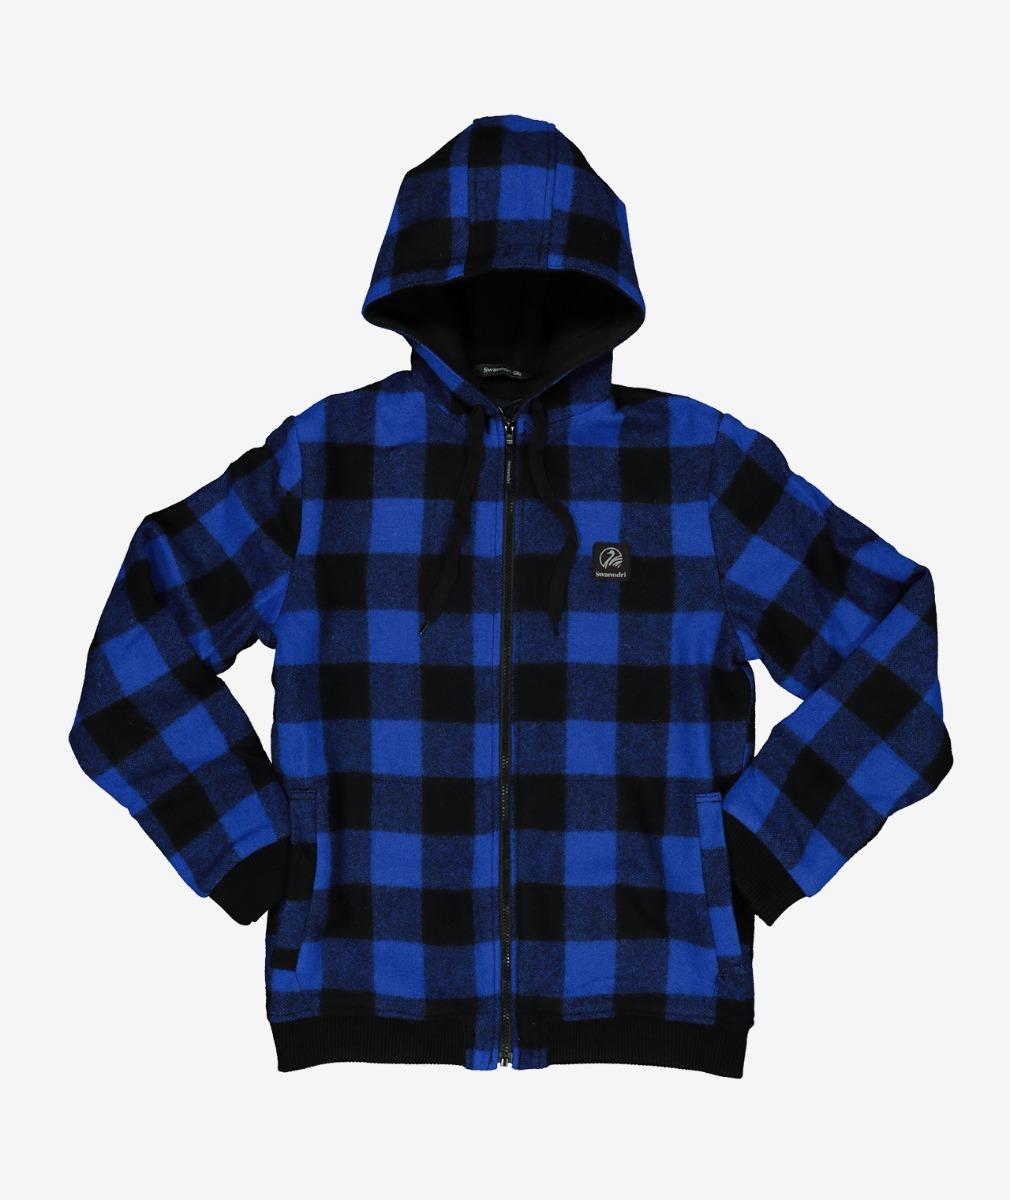 Swanndri Kid's Crooked River Wool Hoody in Blue/Black Check